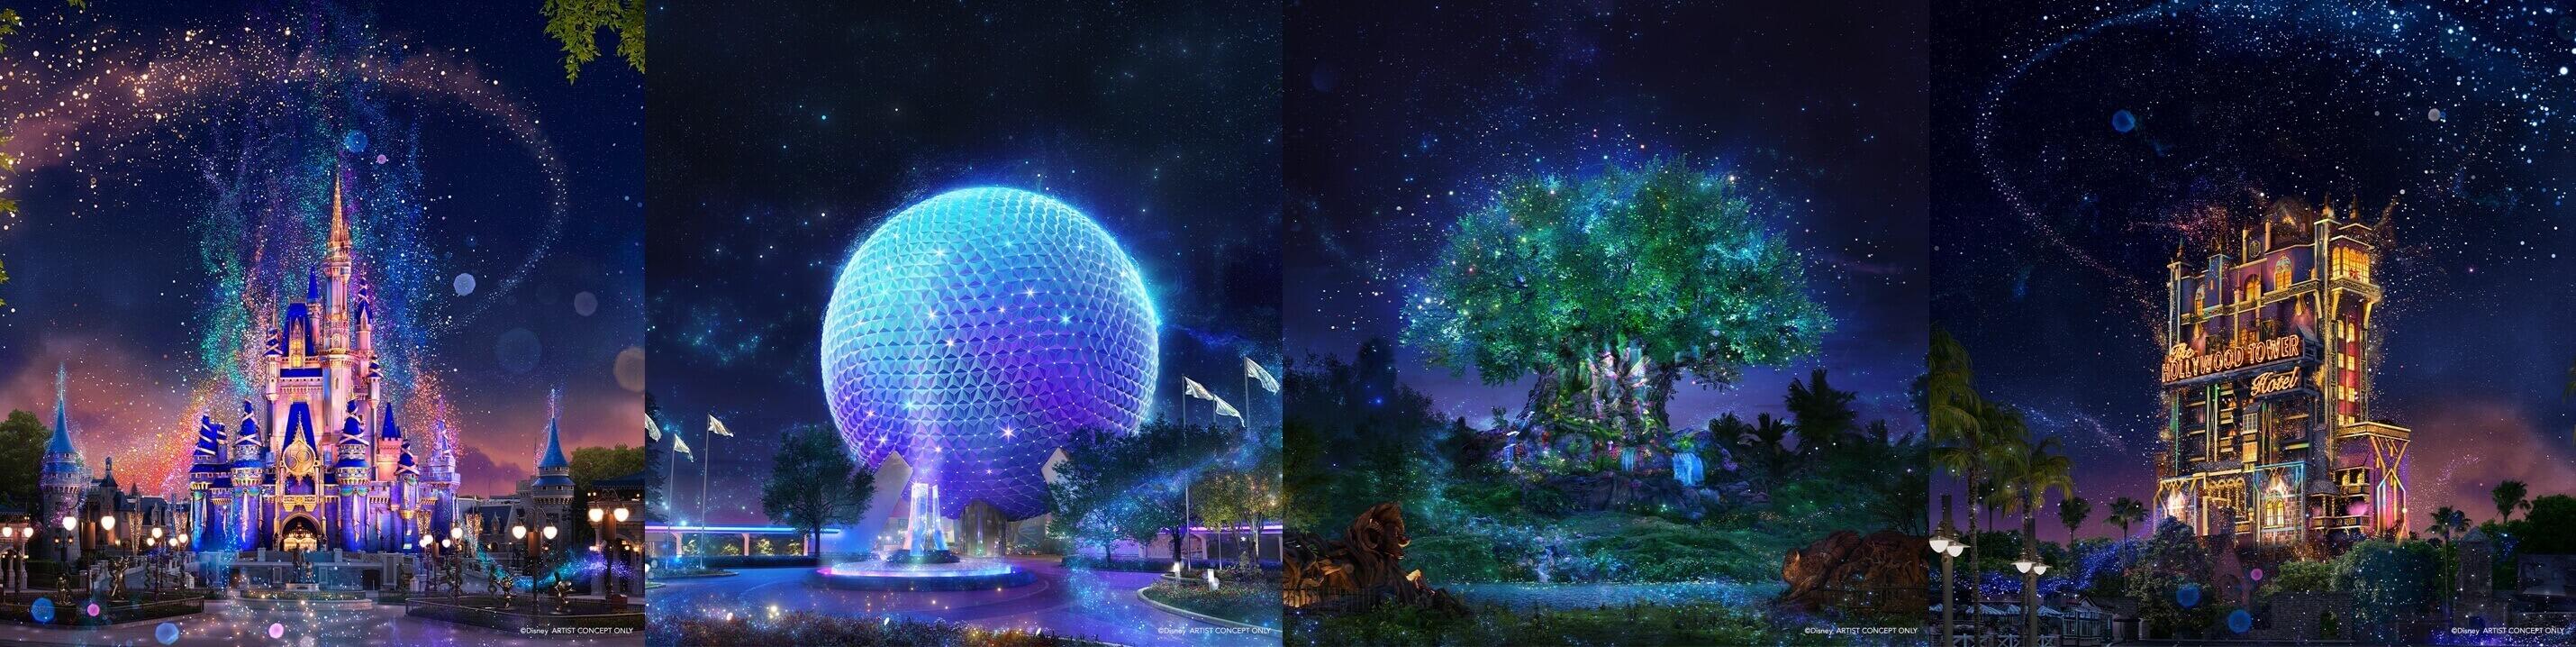 Walt Disney World Theme Park Images